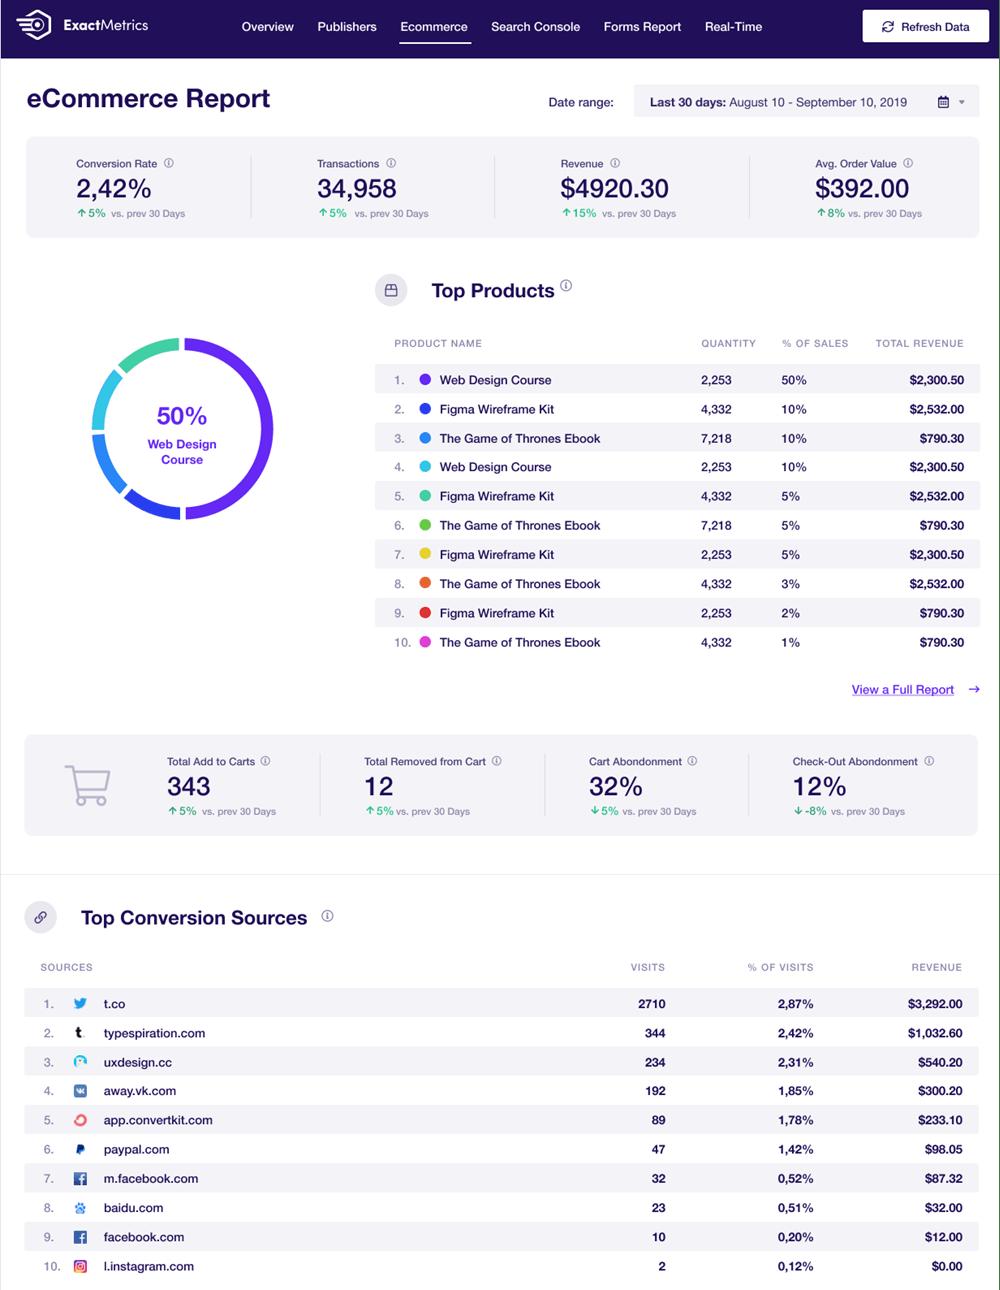 ExactMetrics Google Analytics Dashboard For WP eCommerce Report